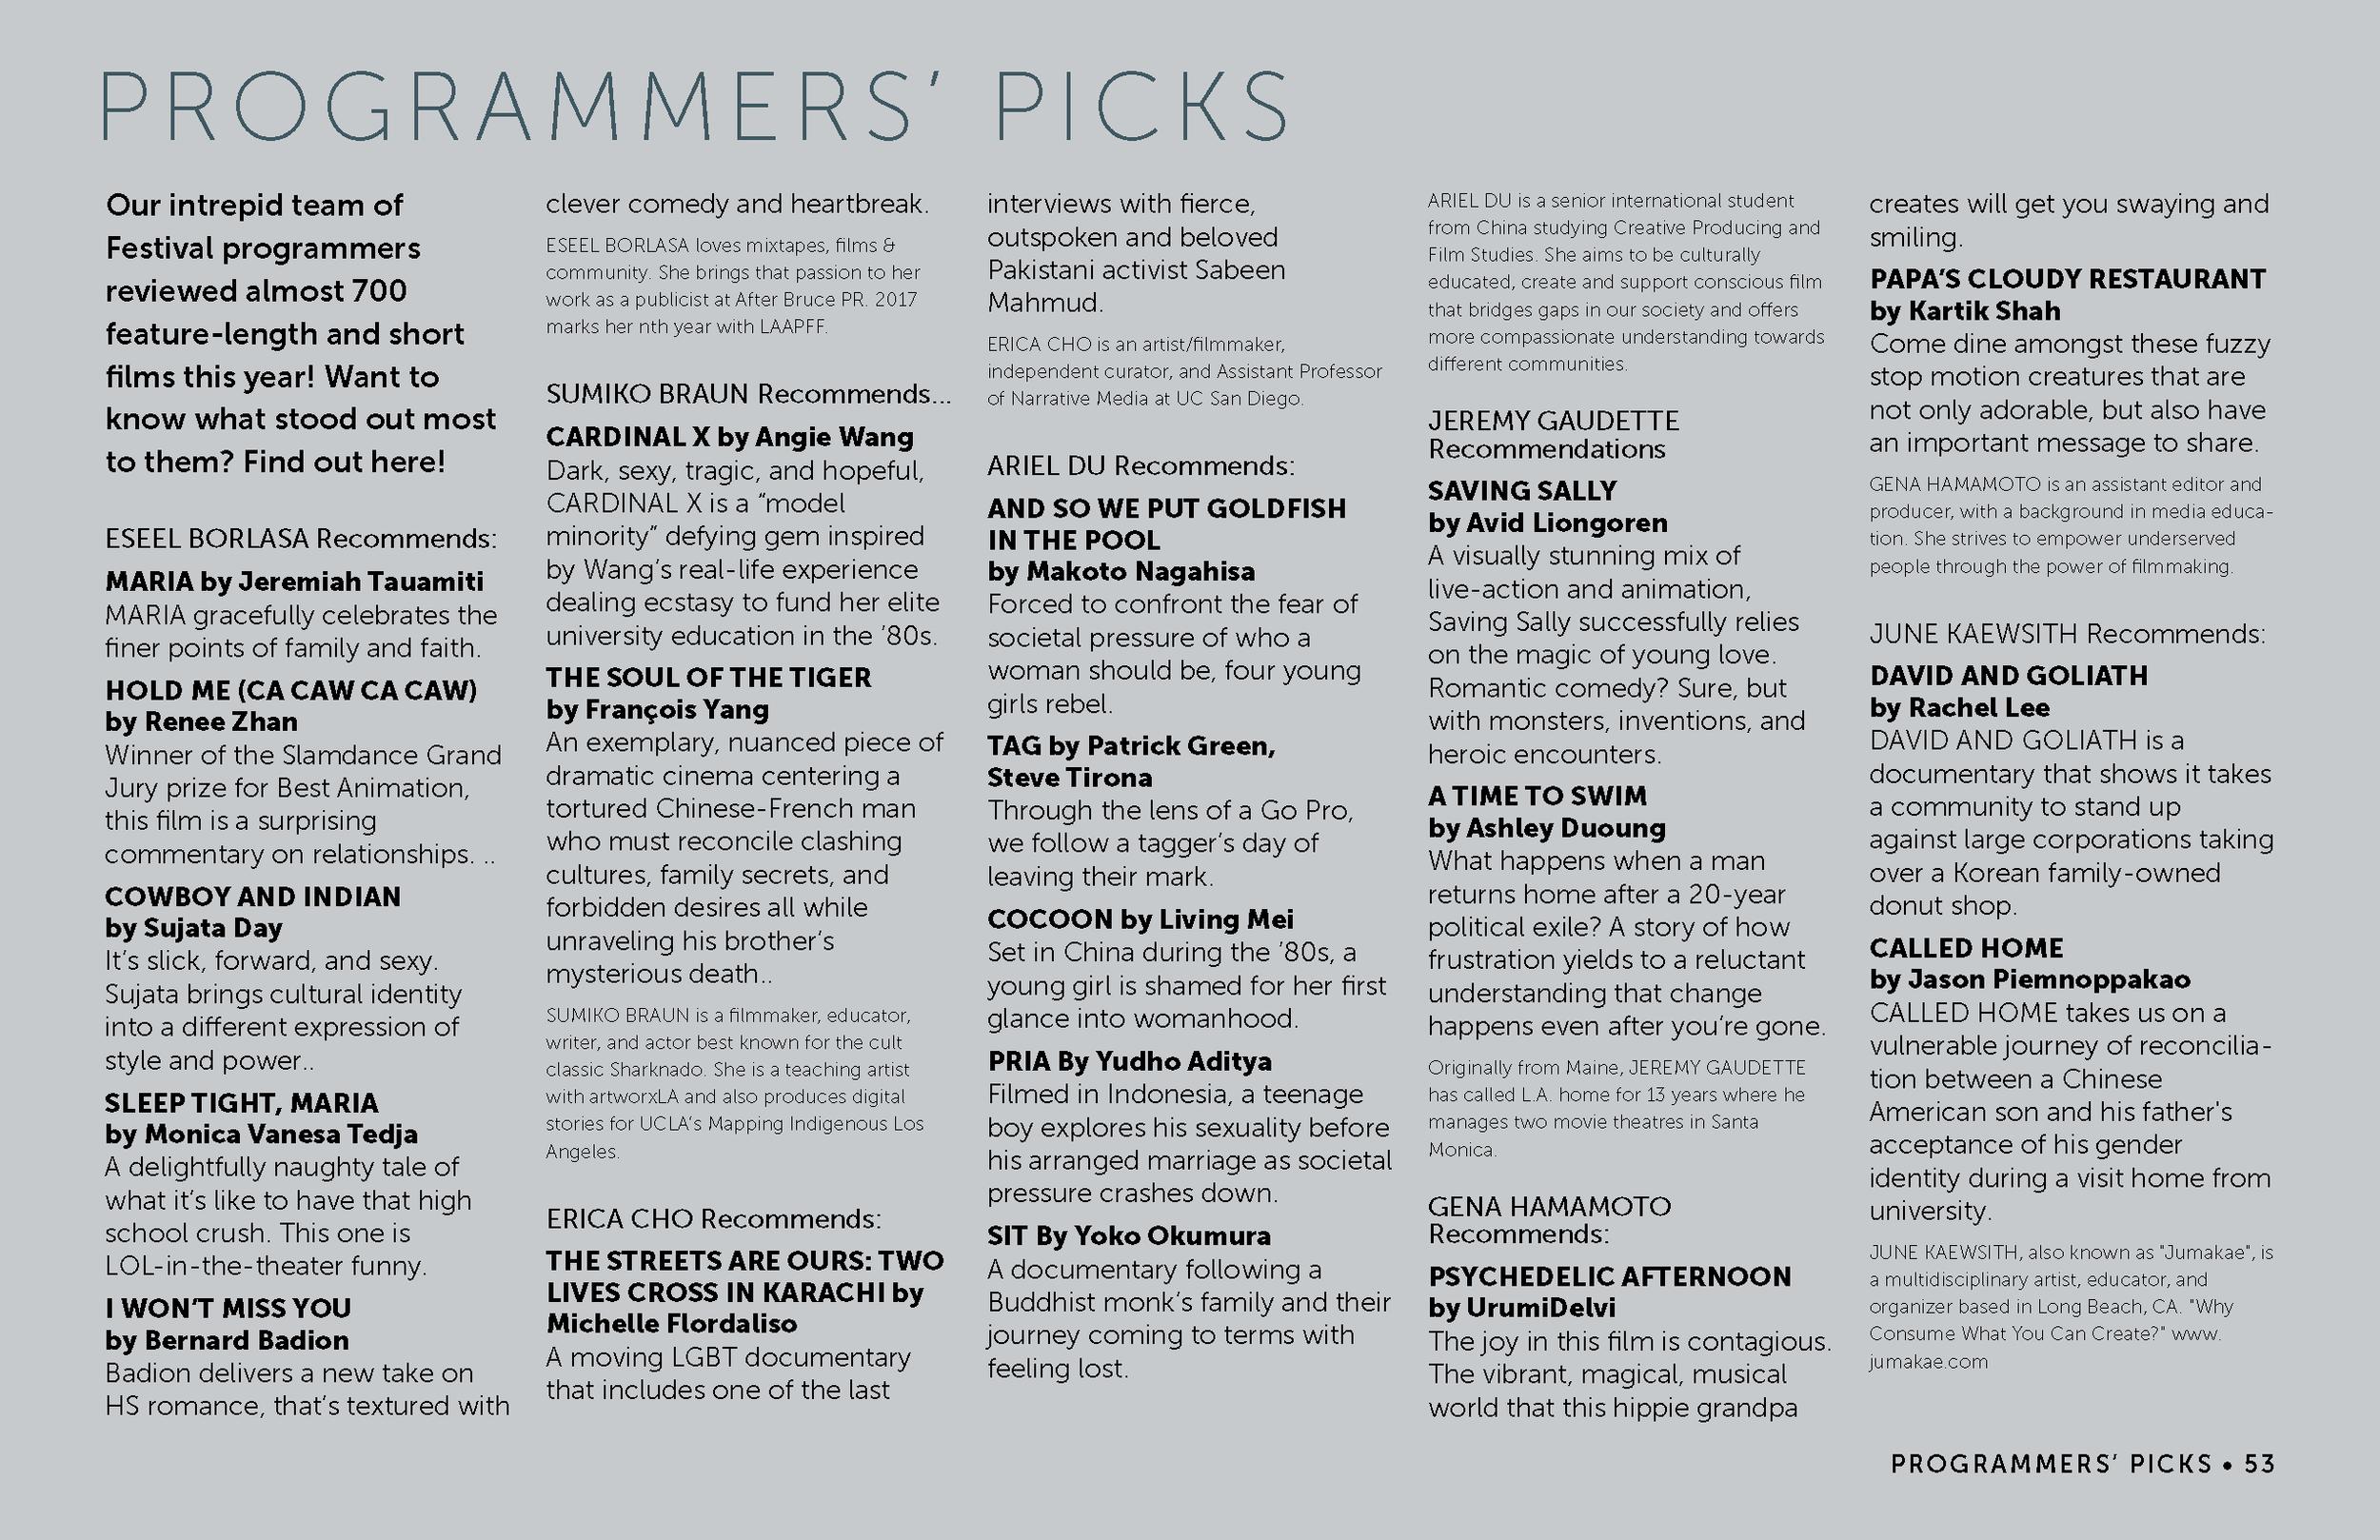 LAAPFF 2017 Programmers' Picks